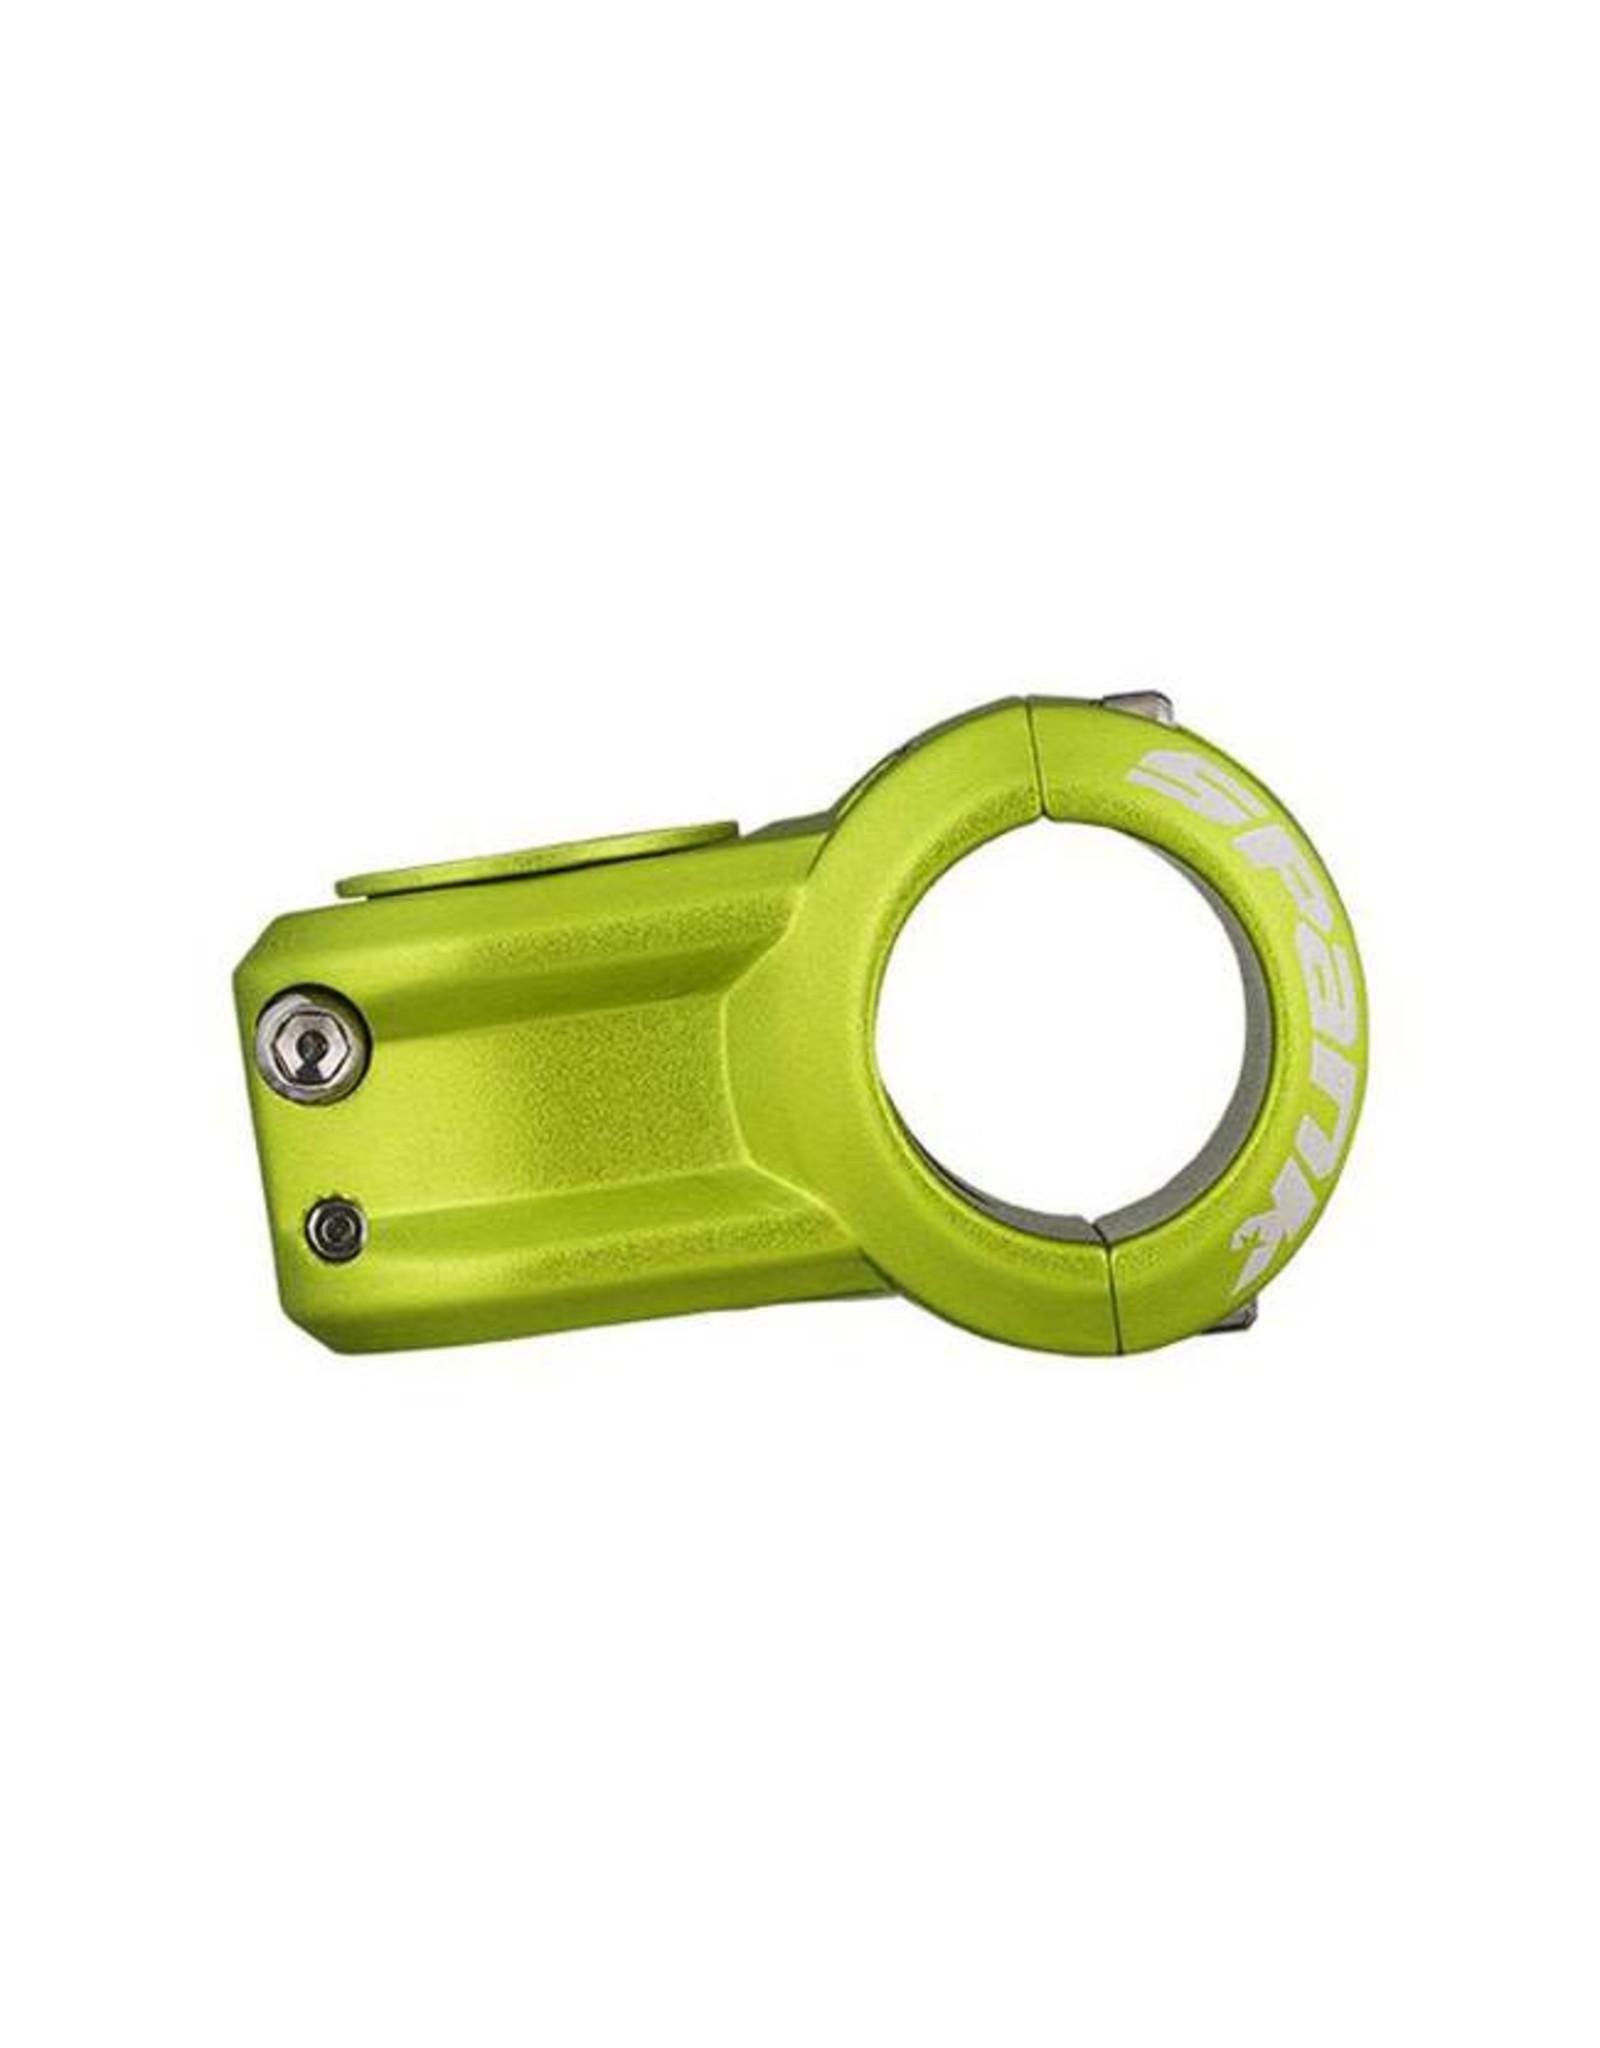 Spank Spank Spoon Stem 40mm, 31.8, Matte Green